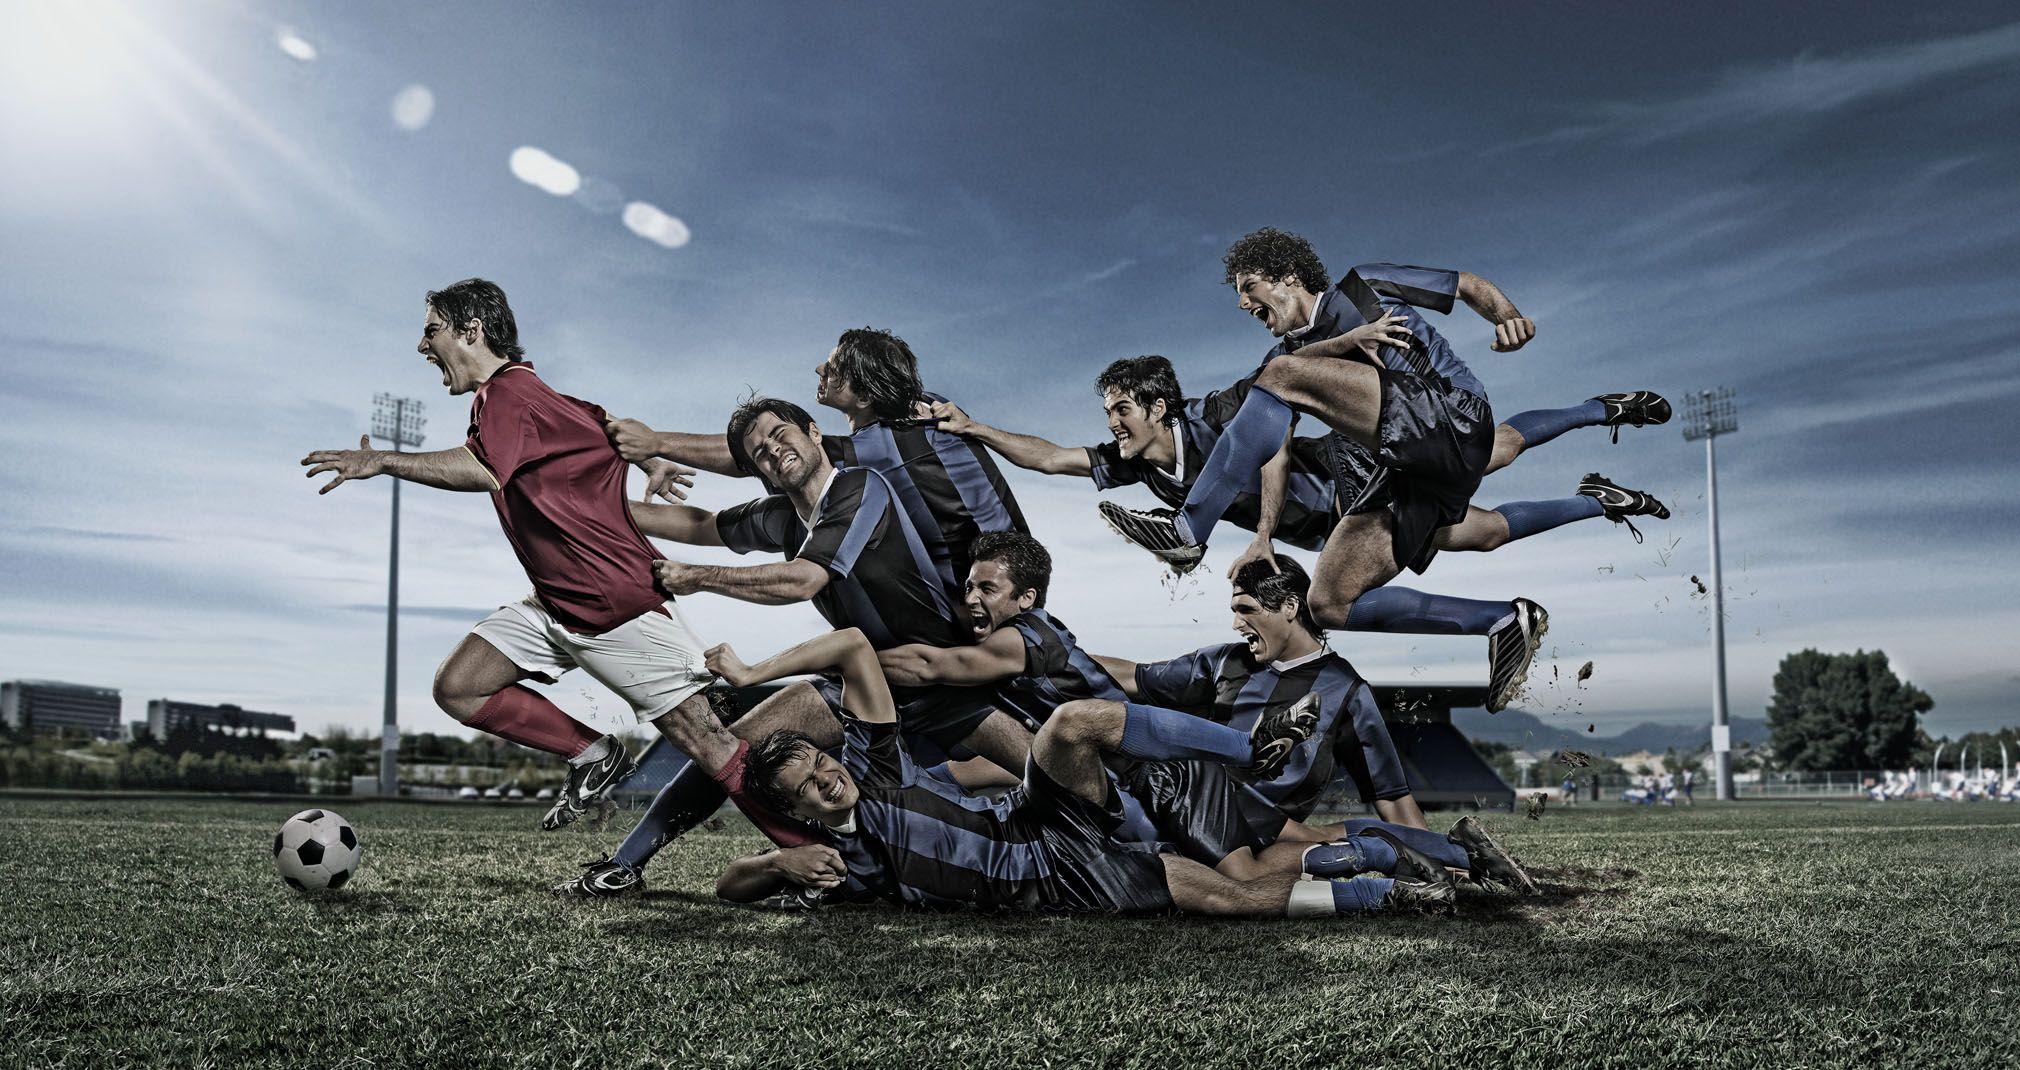 Football Wallpaper Hd Download - http://www.wallpapersoccer.com/football-wallpaper-hd-download ...